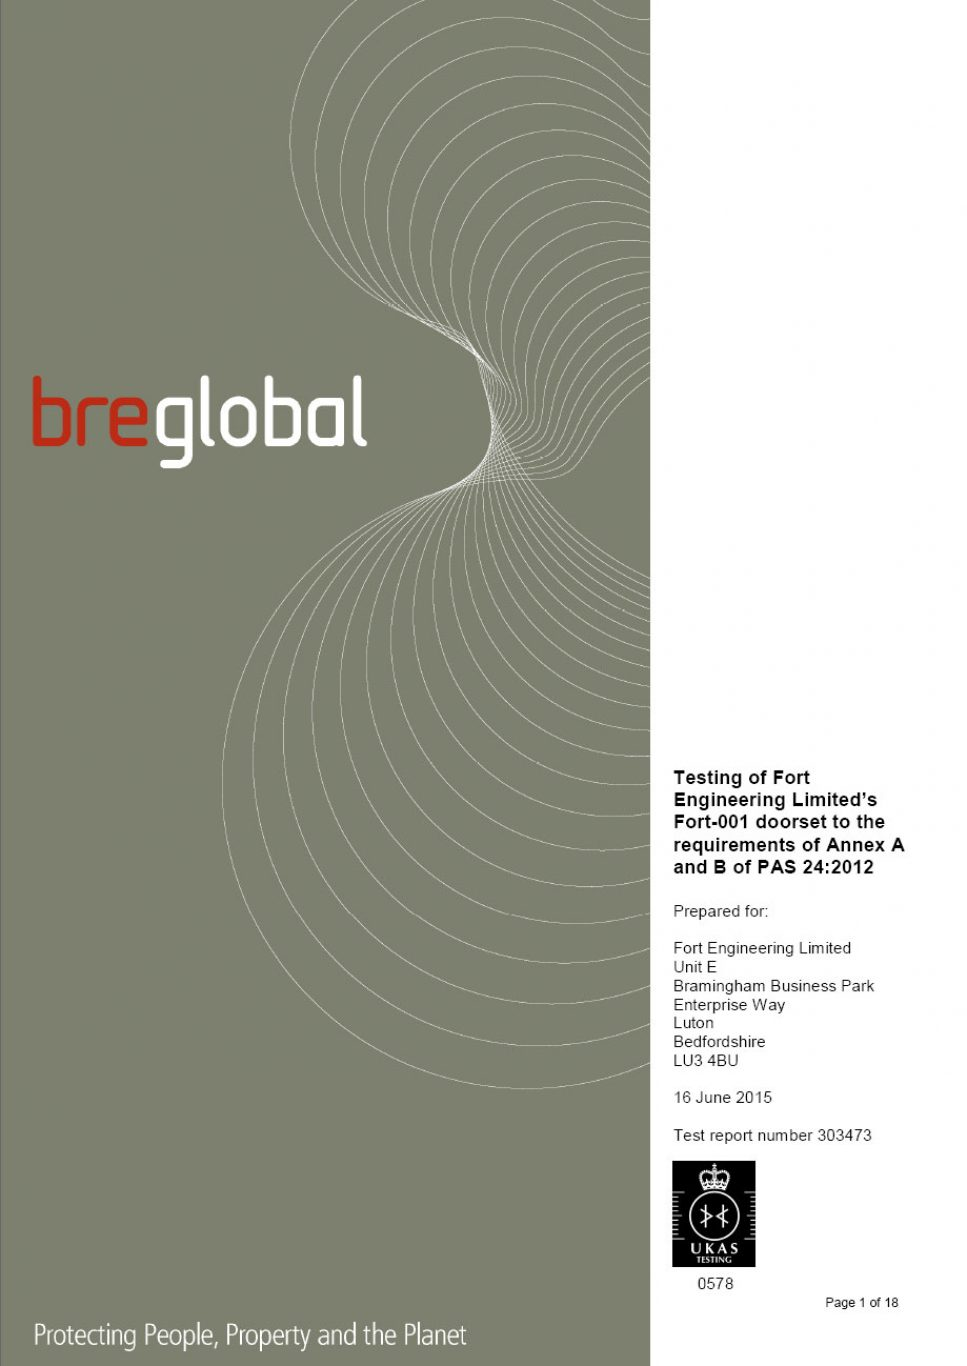 Bre Global